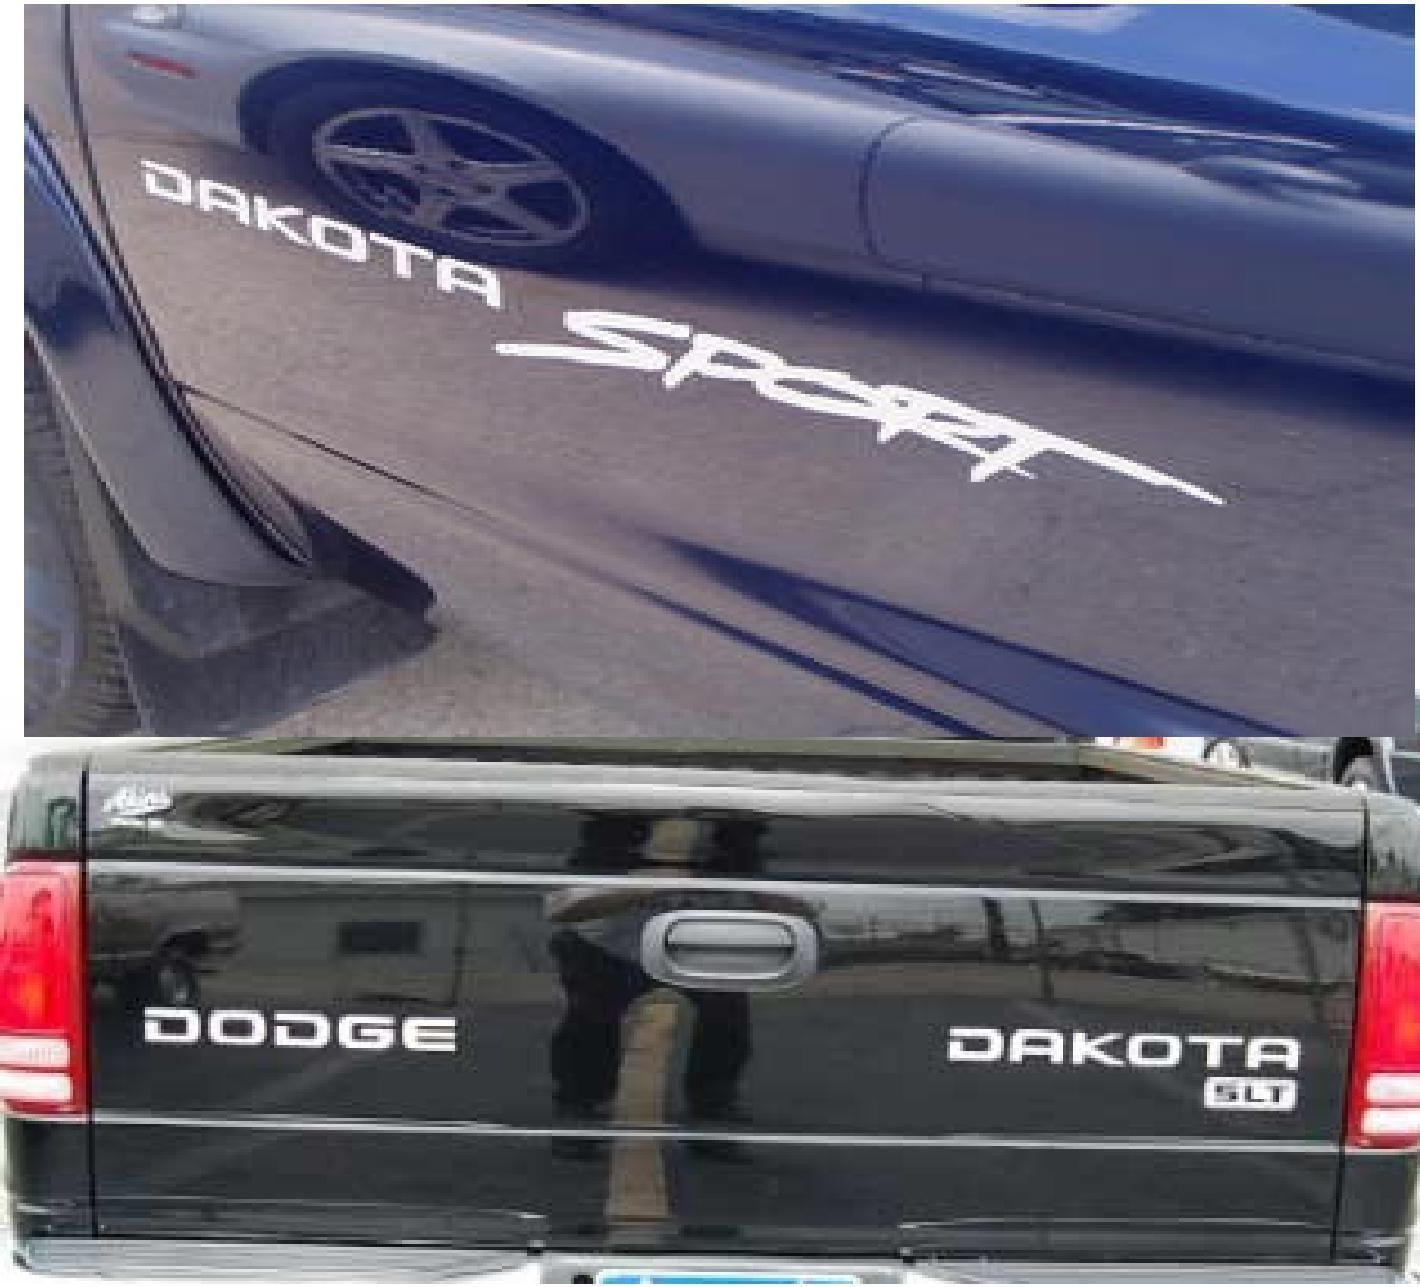 dodge dakota decals Dodge Dakota Sport decal sticker kit Dodge many colors